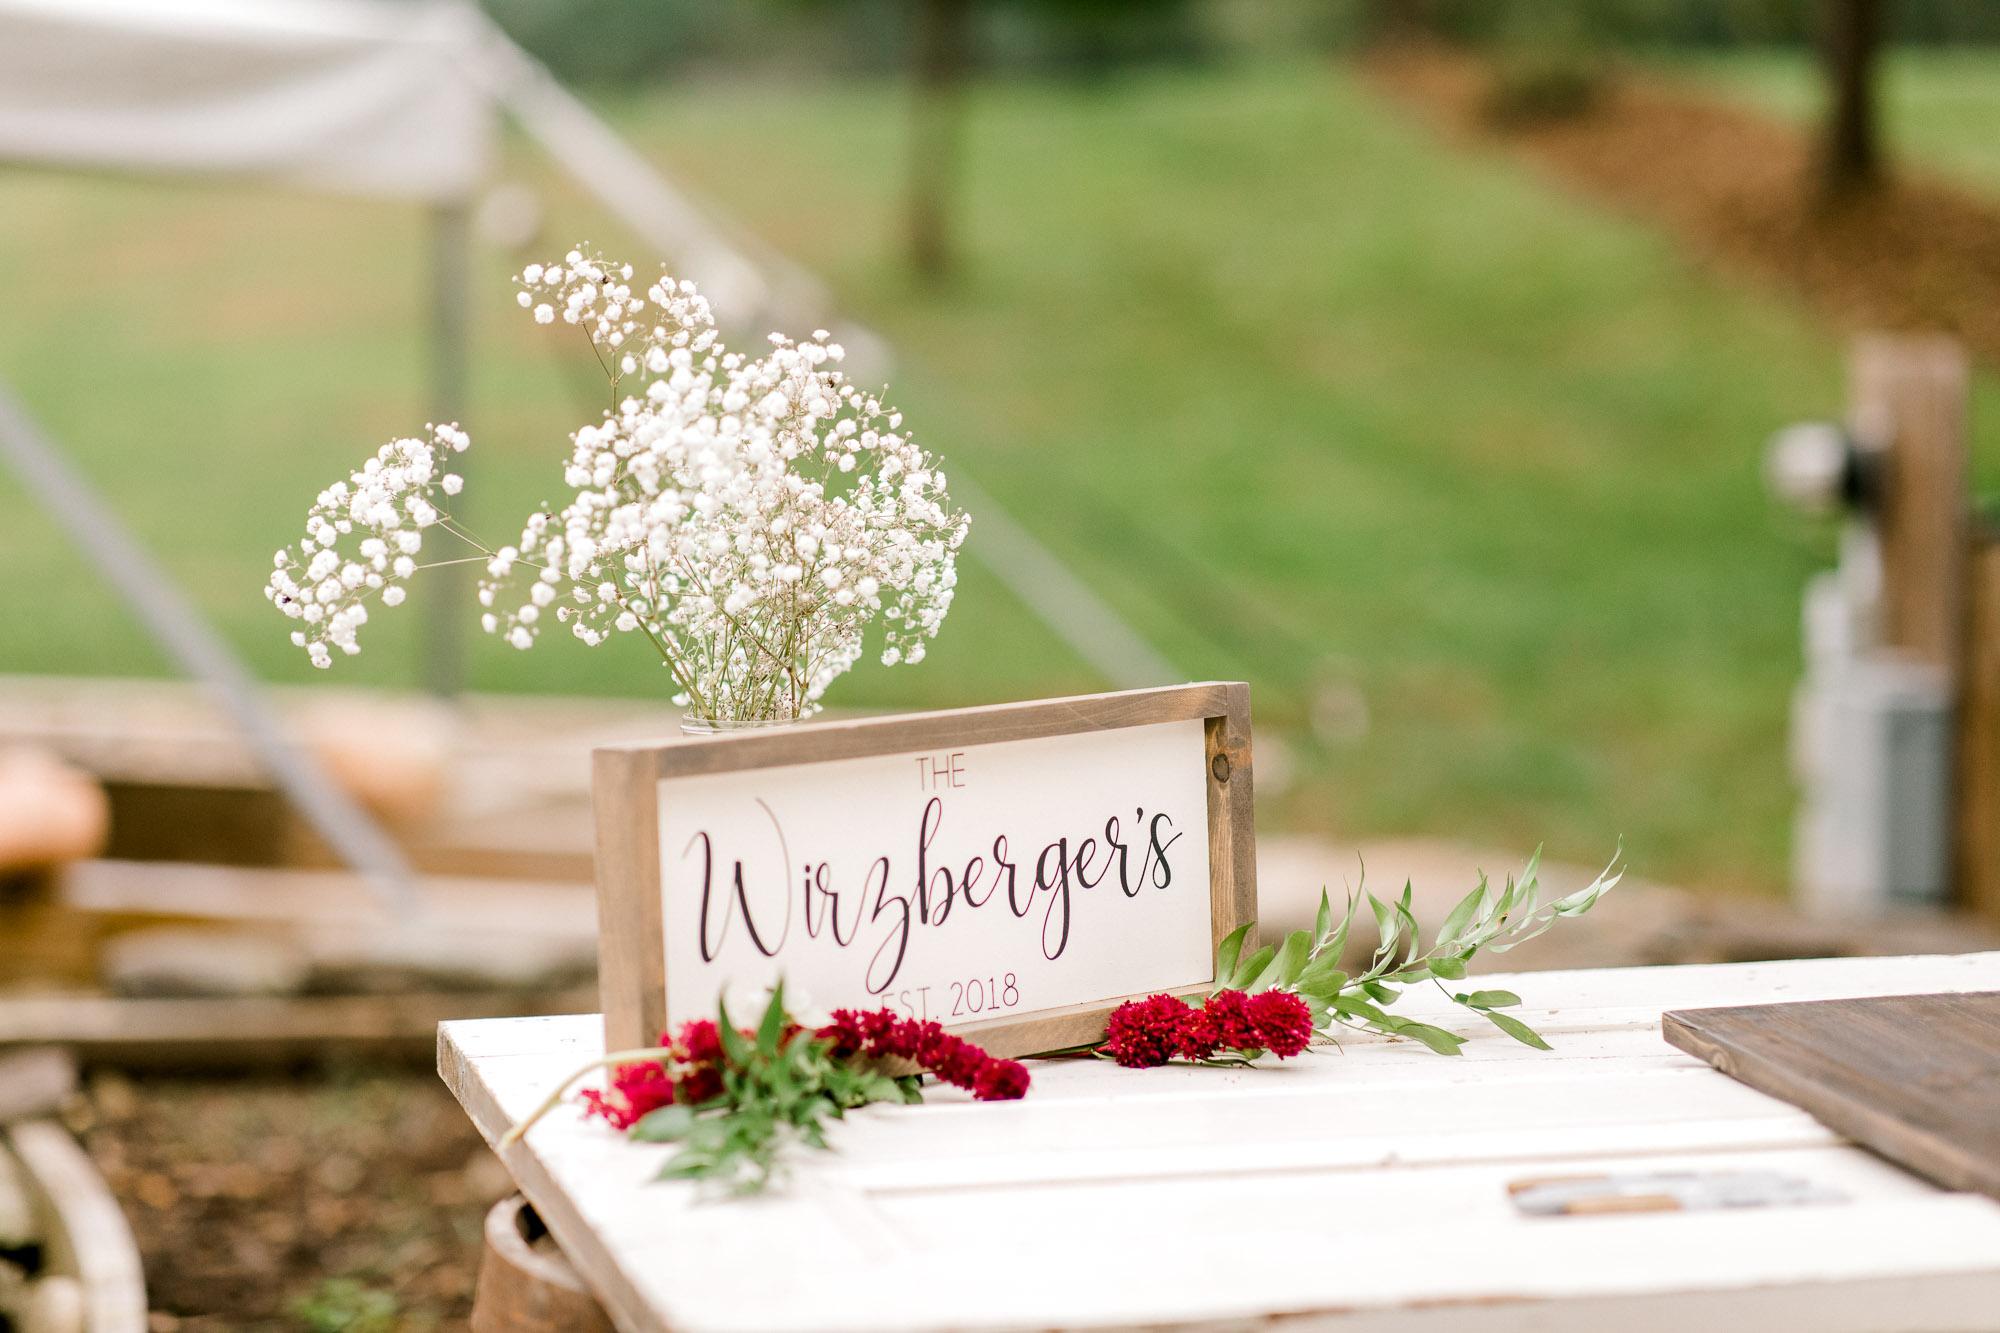 Lodge-at-Raven-Creek-October-wedding-18.jpg